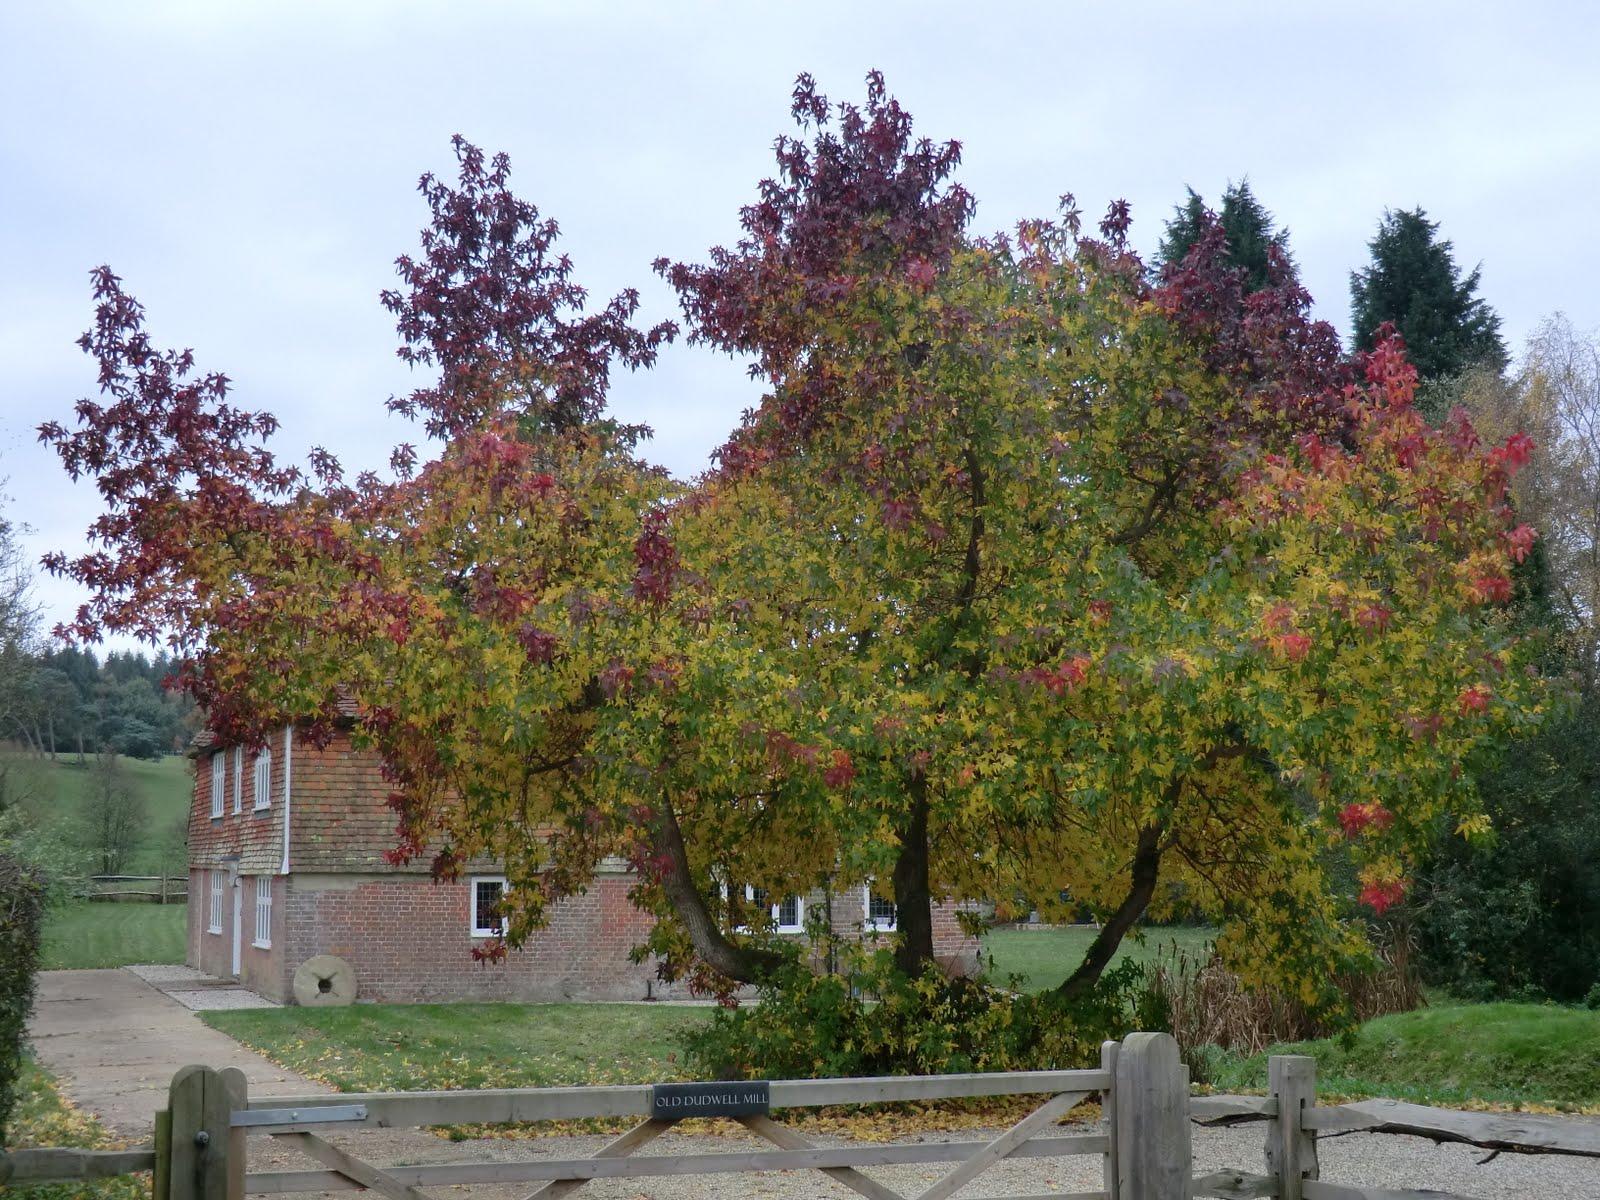 CIMG0240 Liquidambar tree at Old Dudwell Mill